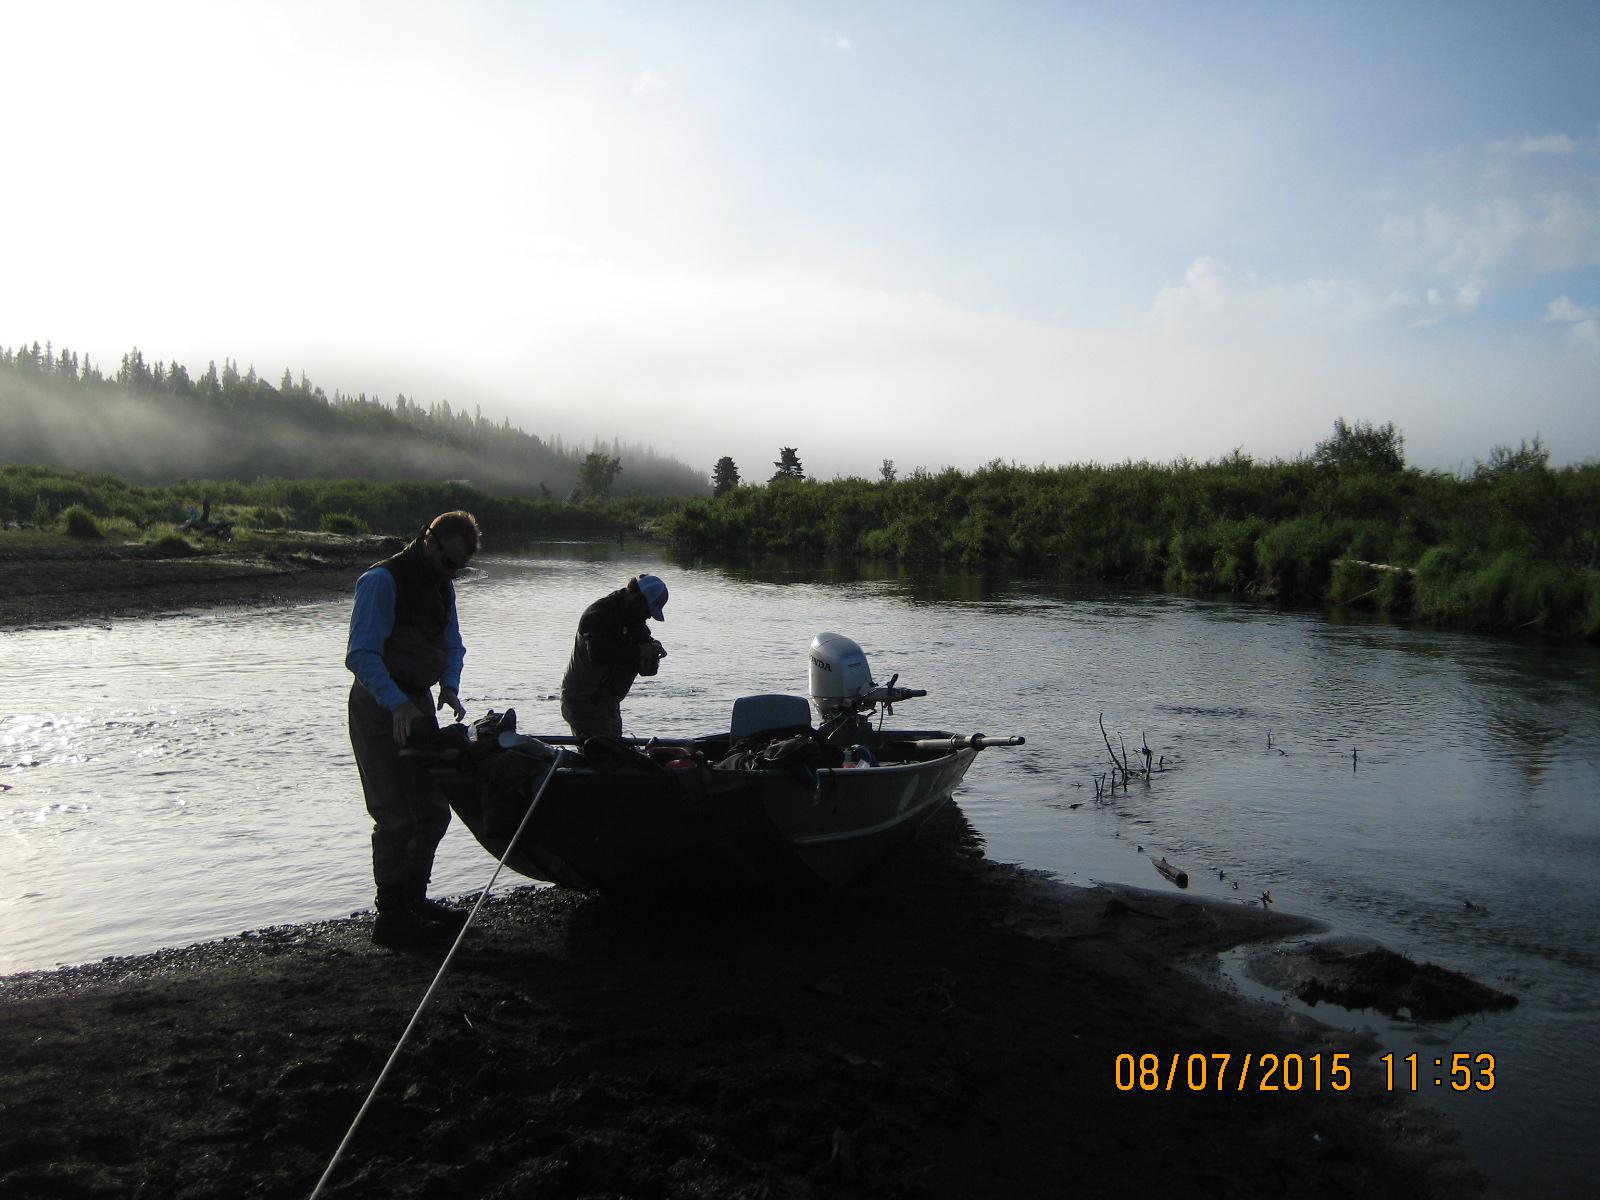 Rob and Greg rigging up for Sunshine Creek